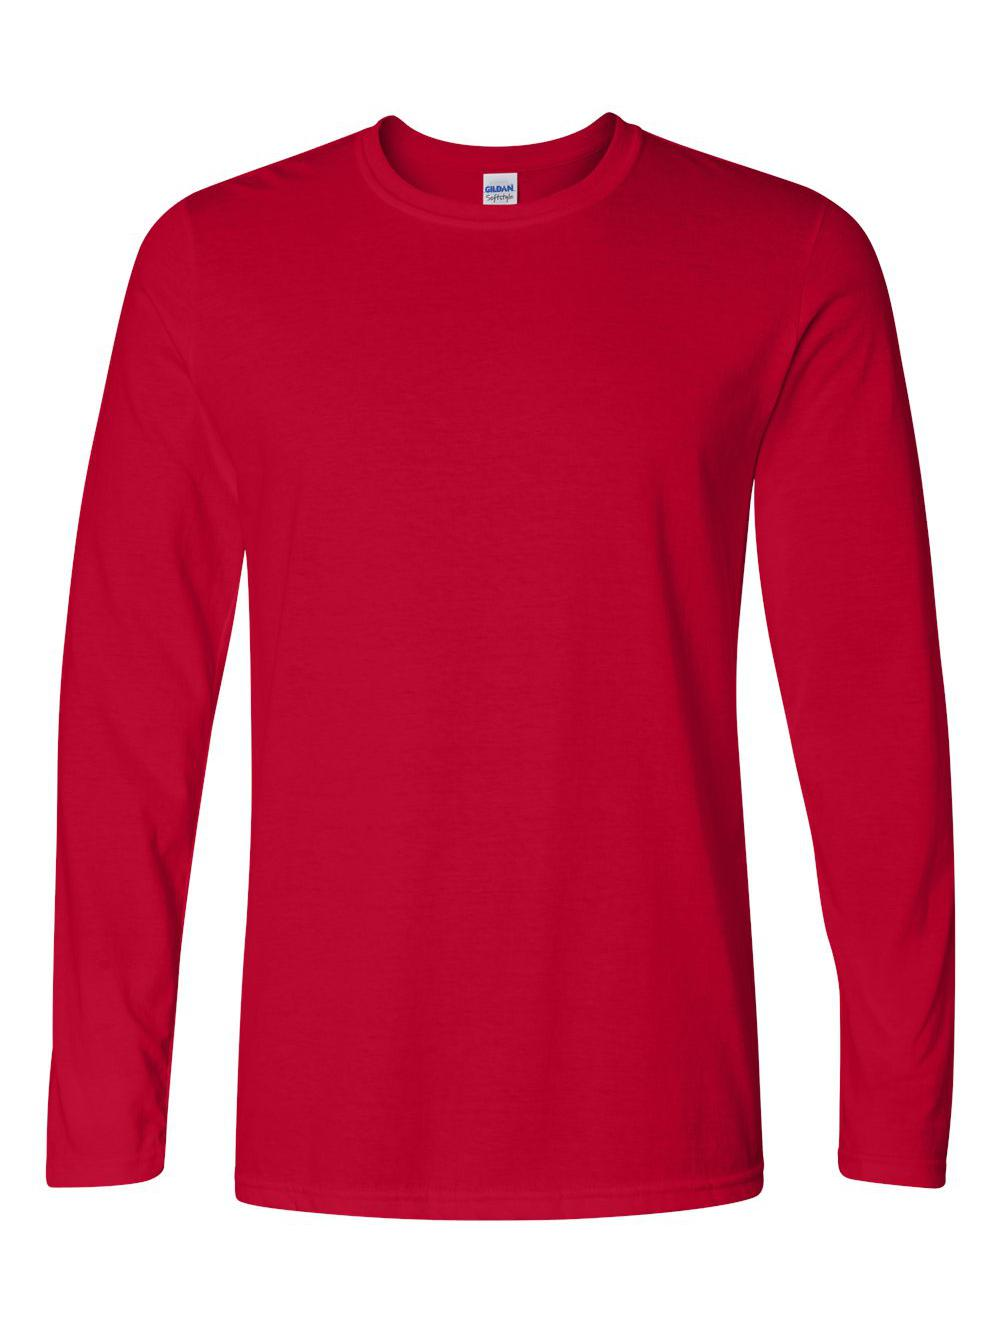 Gildan-Softstyle-Long-Sleeve-T-Shirt-64400 thumbnail 9